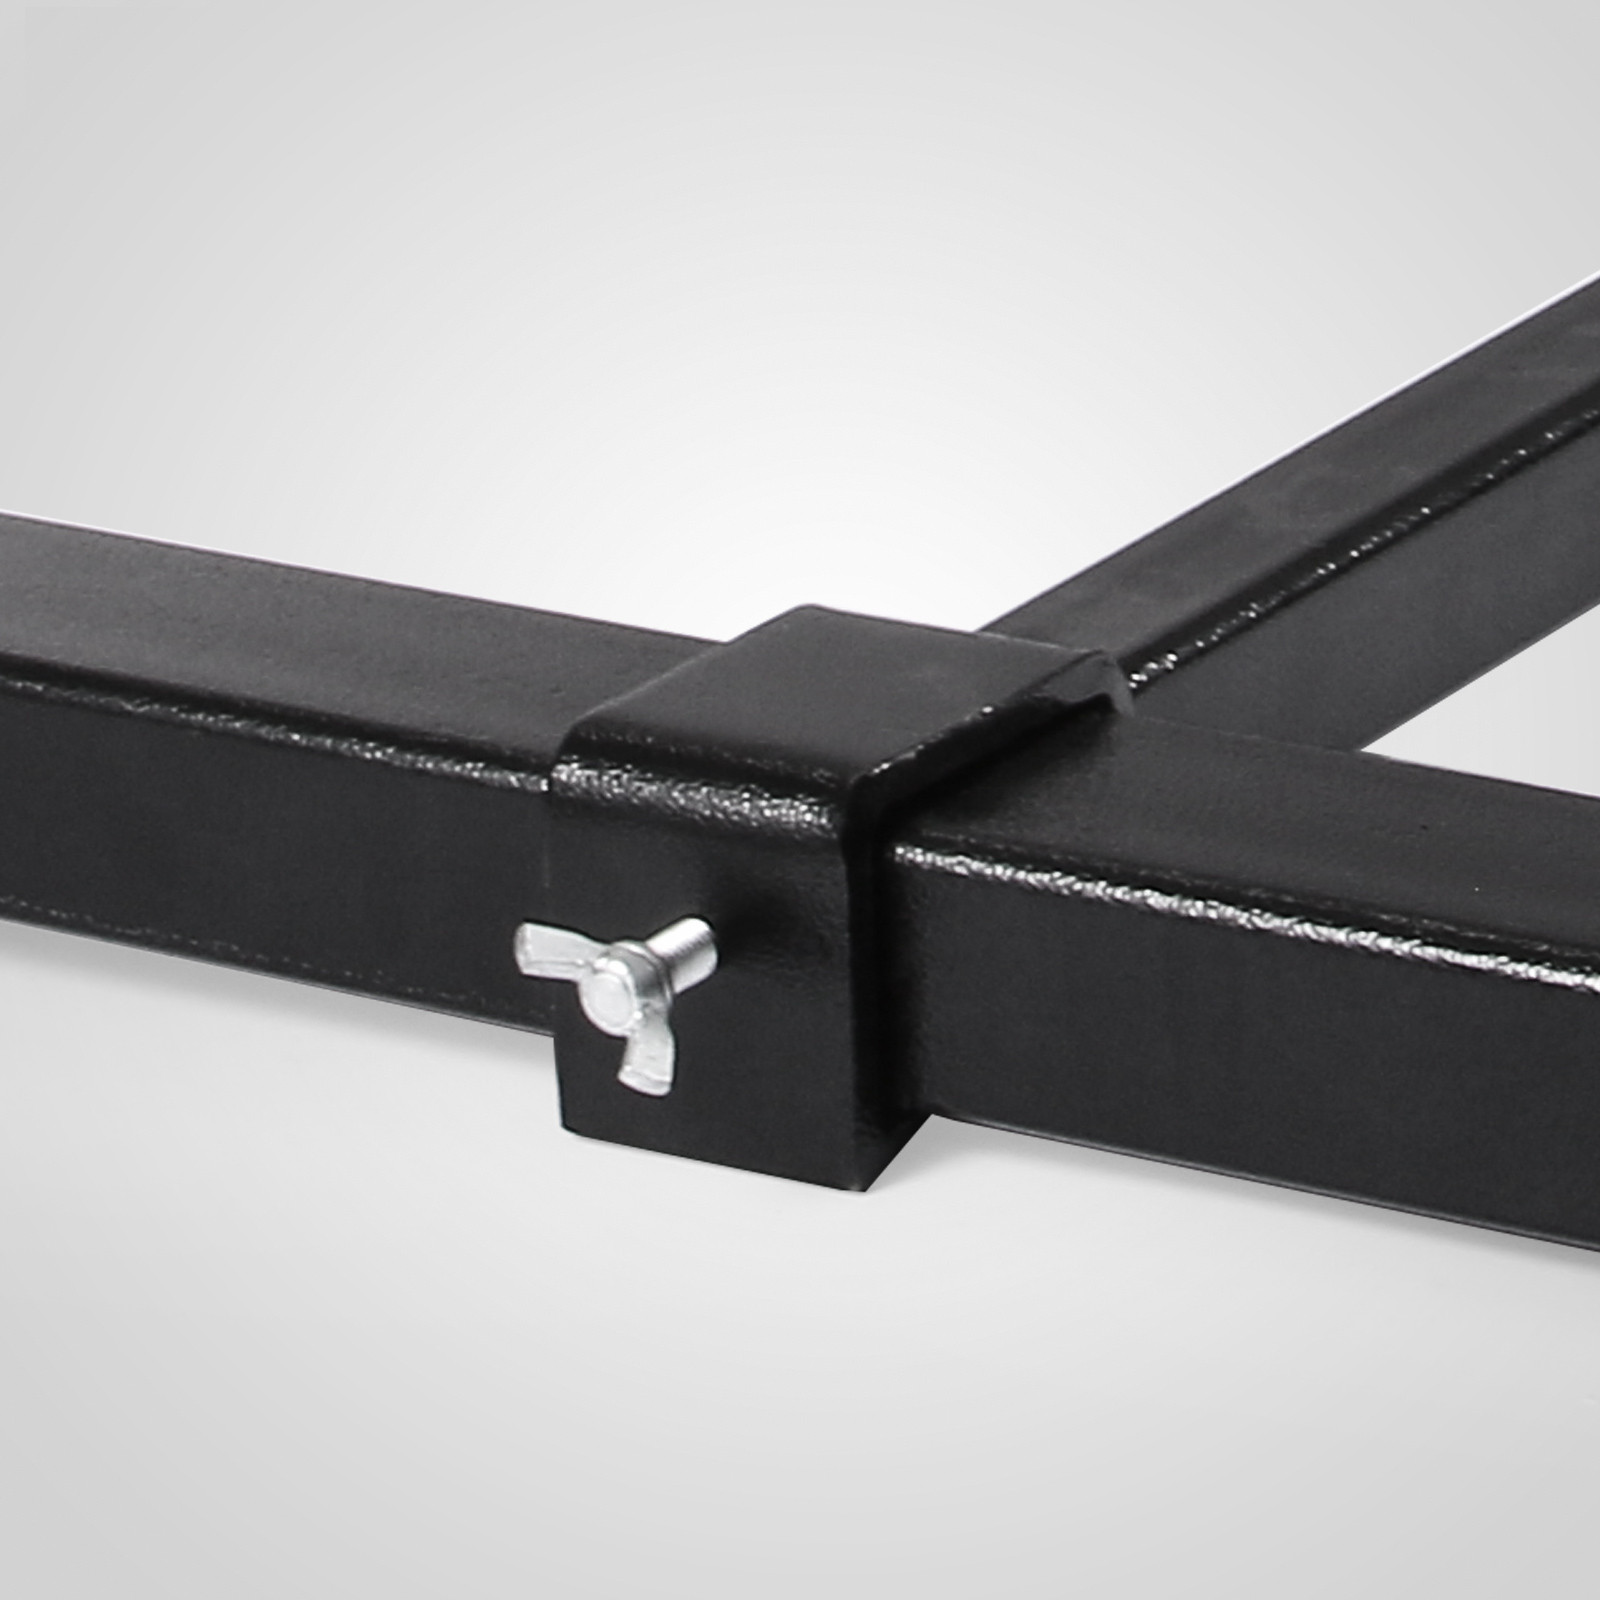 Tractor Bucket Fork Stabilizer Bar : Hd lbs clamp on pallet forks loader bucket